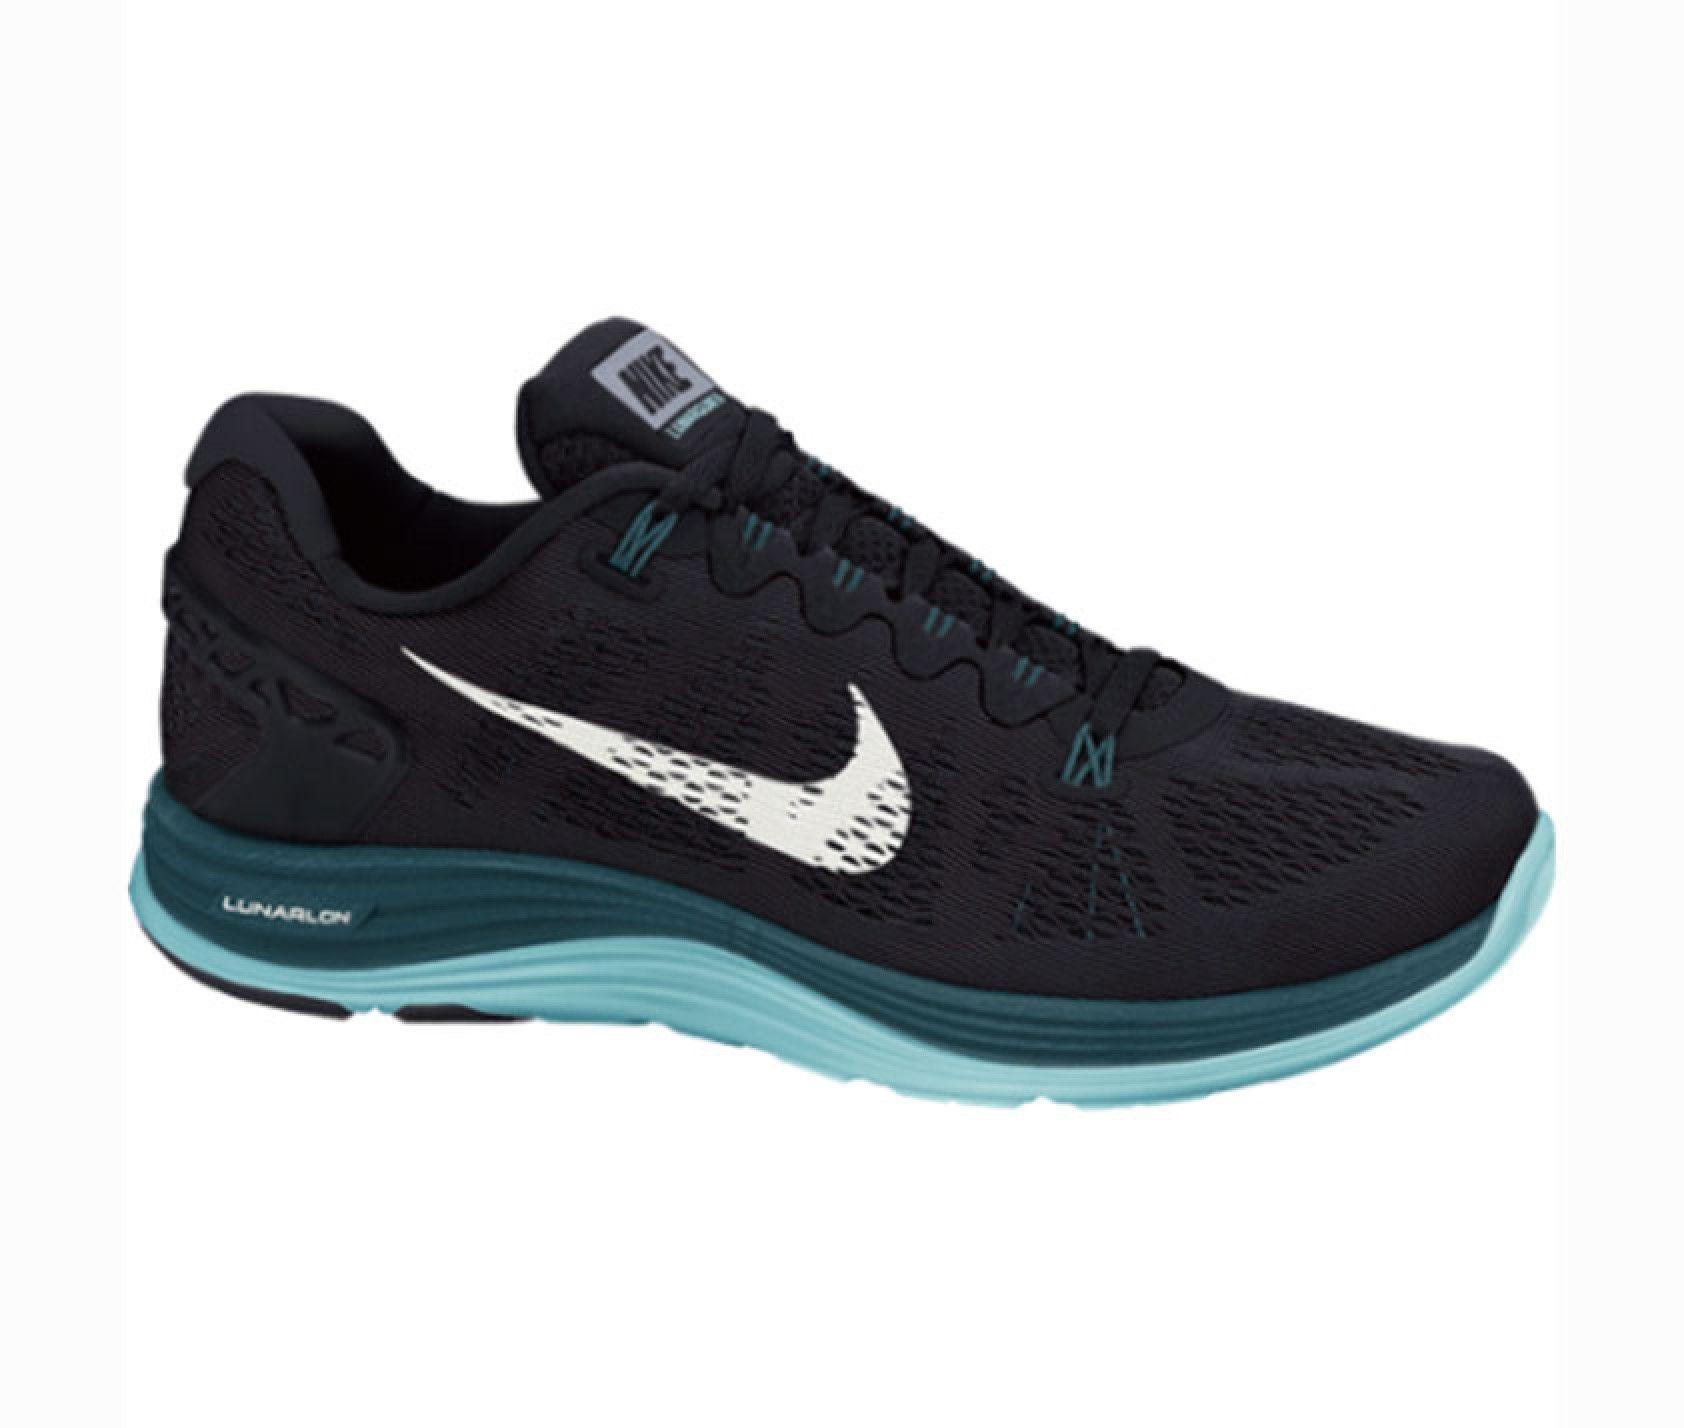 9716d360 NIKE LUNARGLIDE+ 5 NEGRO/TURQUESA MUJER | sneakers nike | Zapatos ...